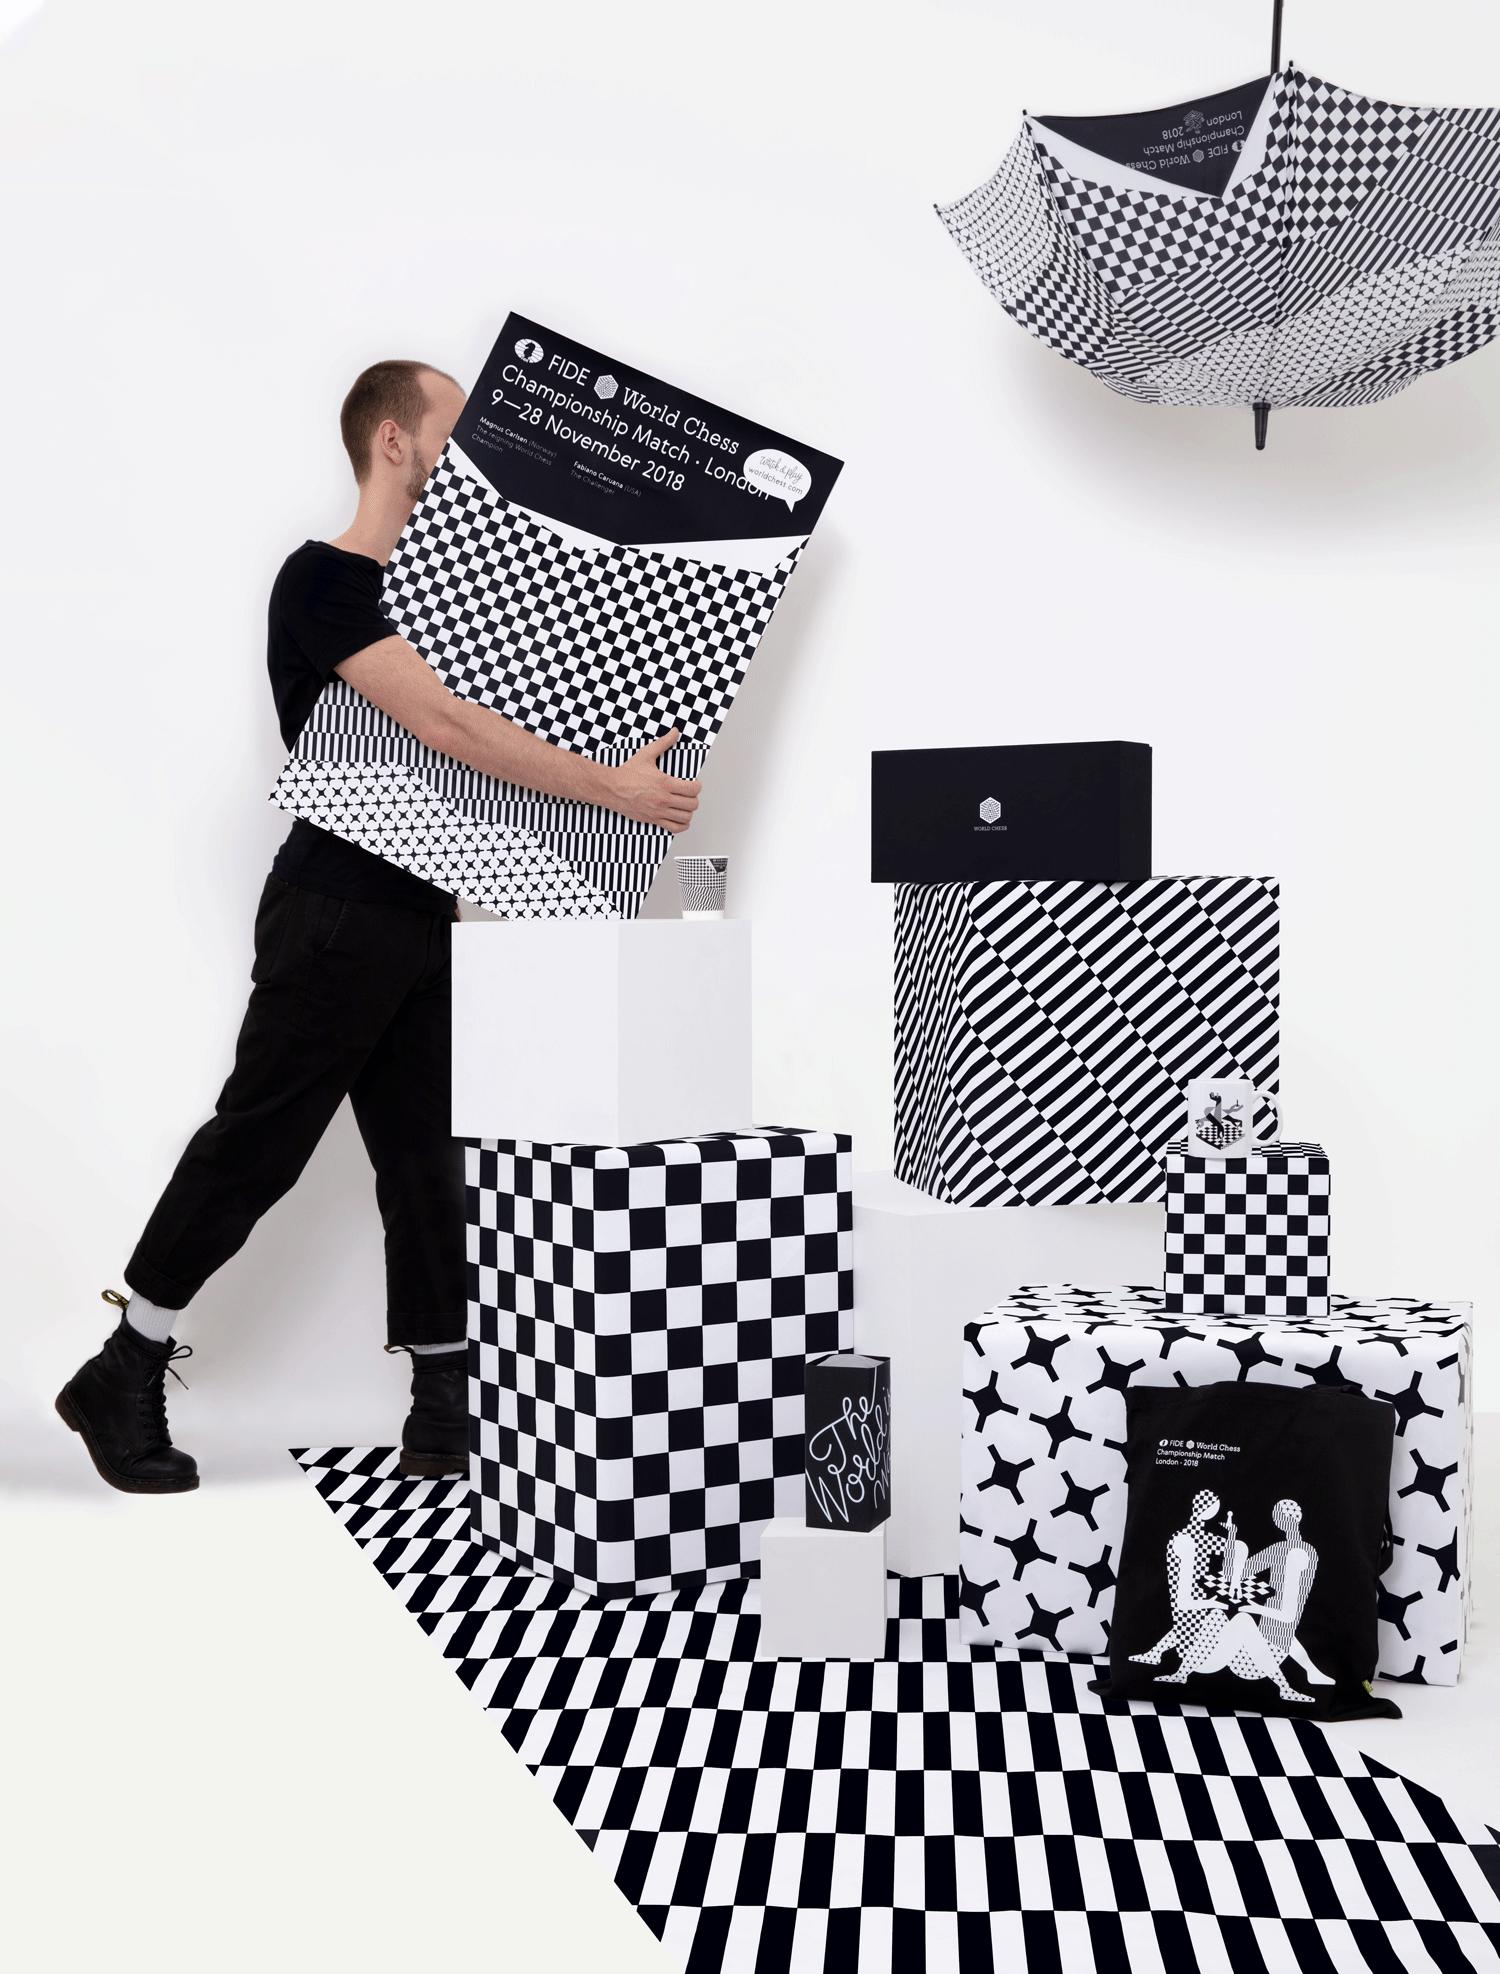 Shuka ♞ 2018 London chess championship venue branding